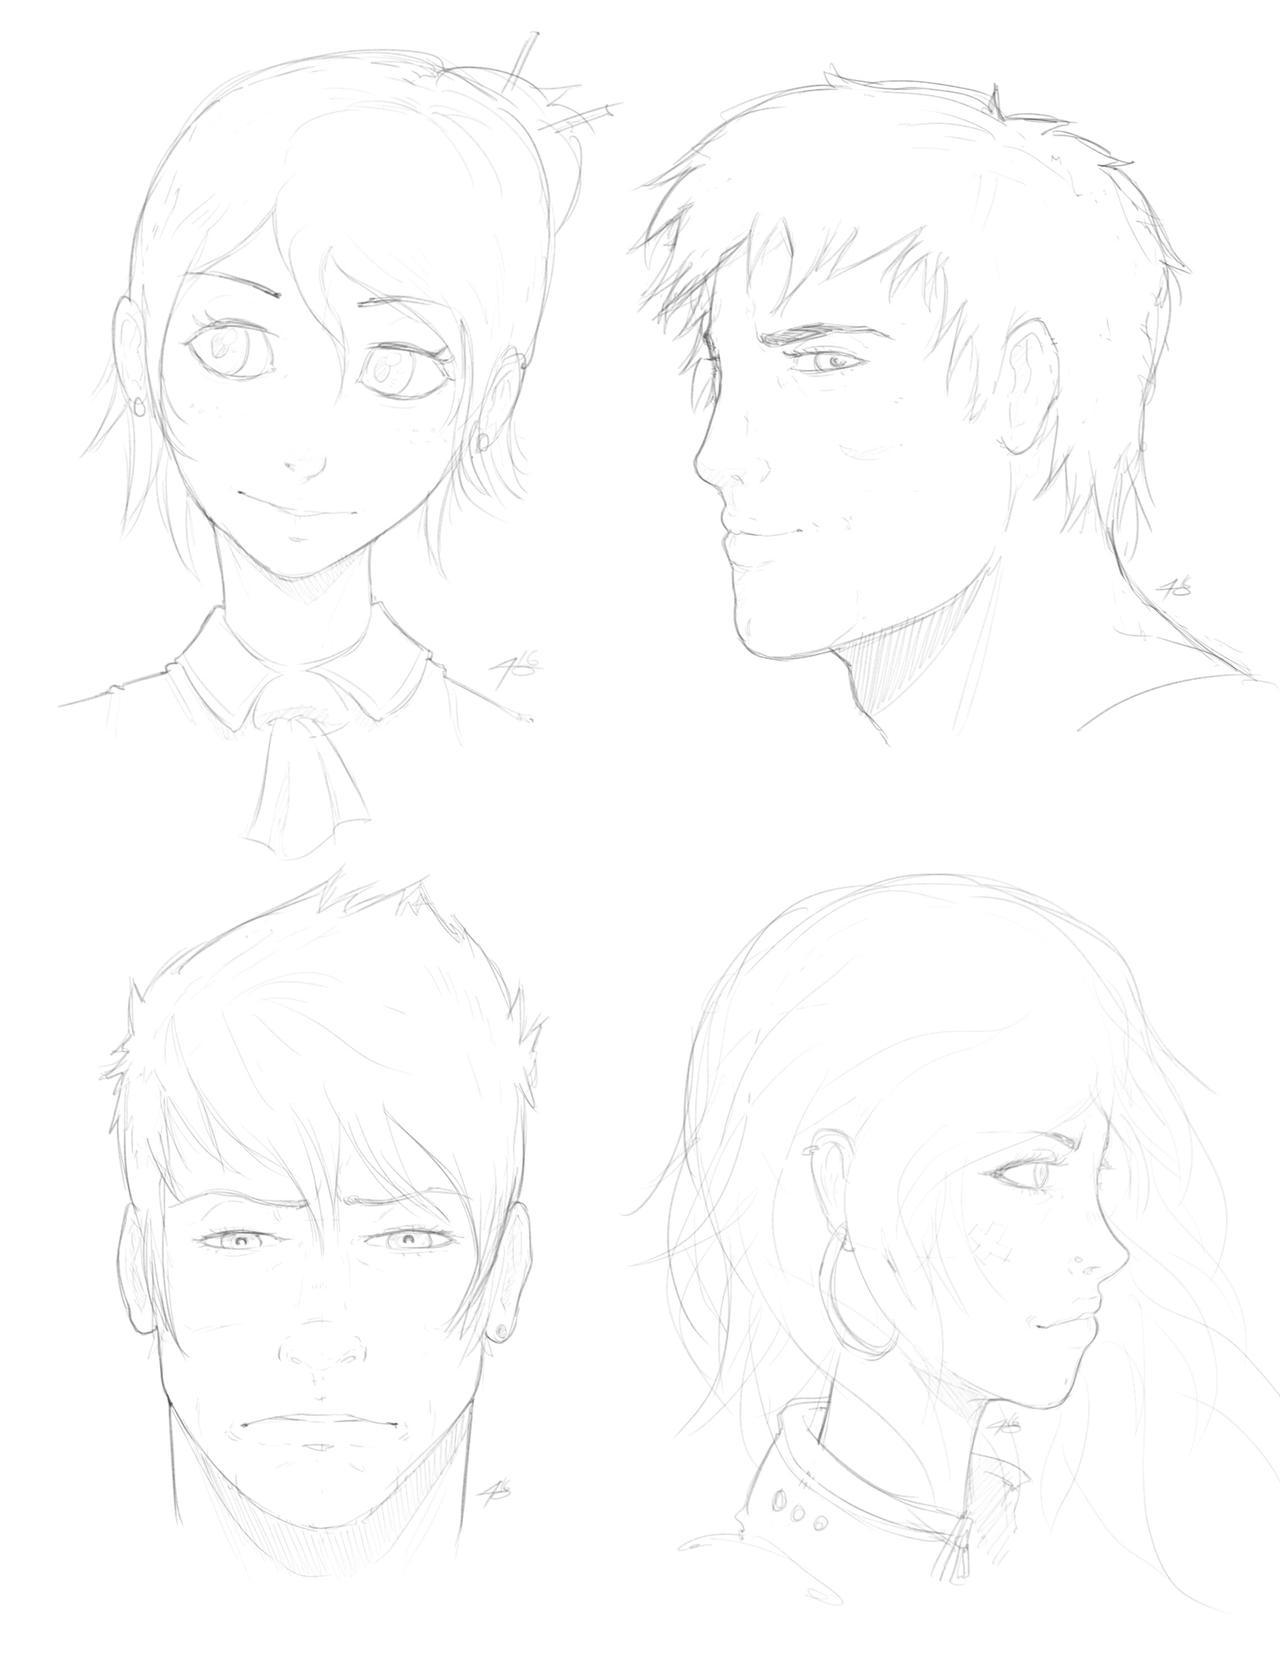 Head Sketches x4 120716 by EzJedi